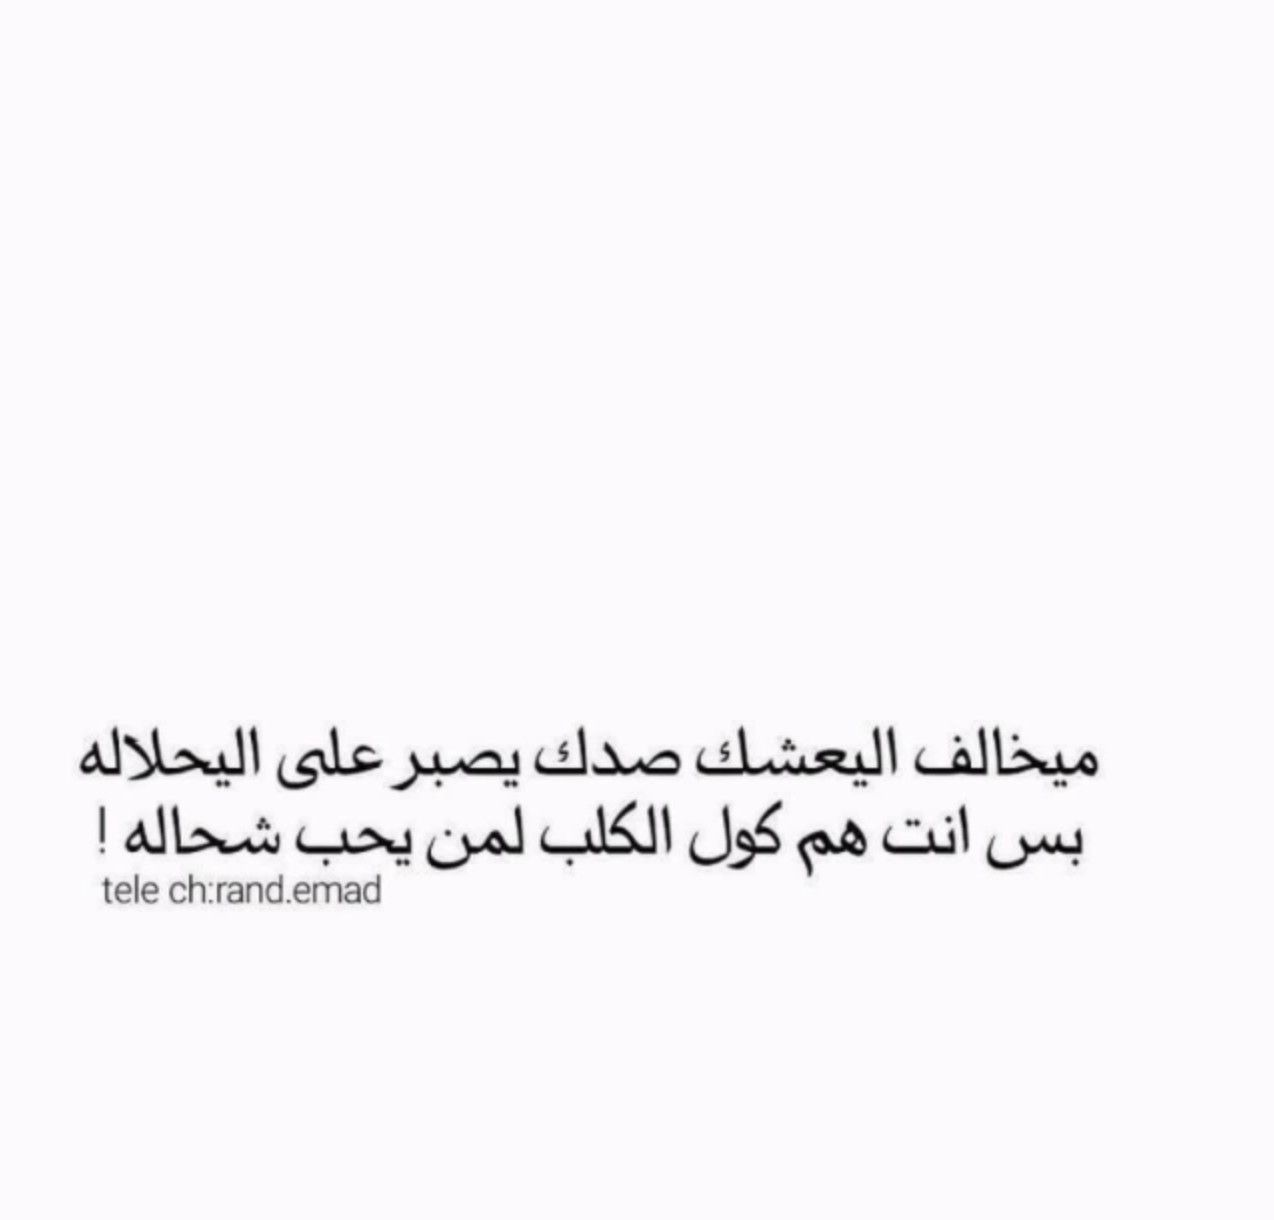 Pin By حورية On كلام معسول Math Arabic Calligraphy Math Equations